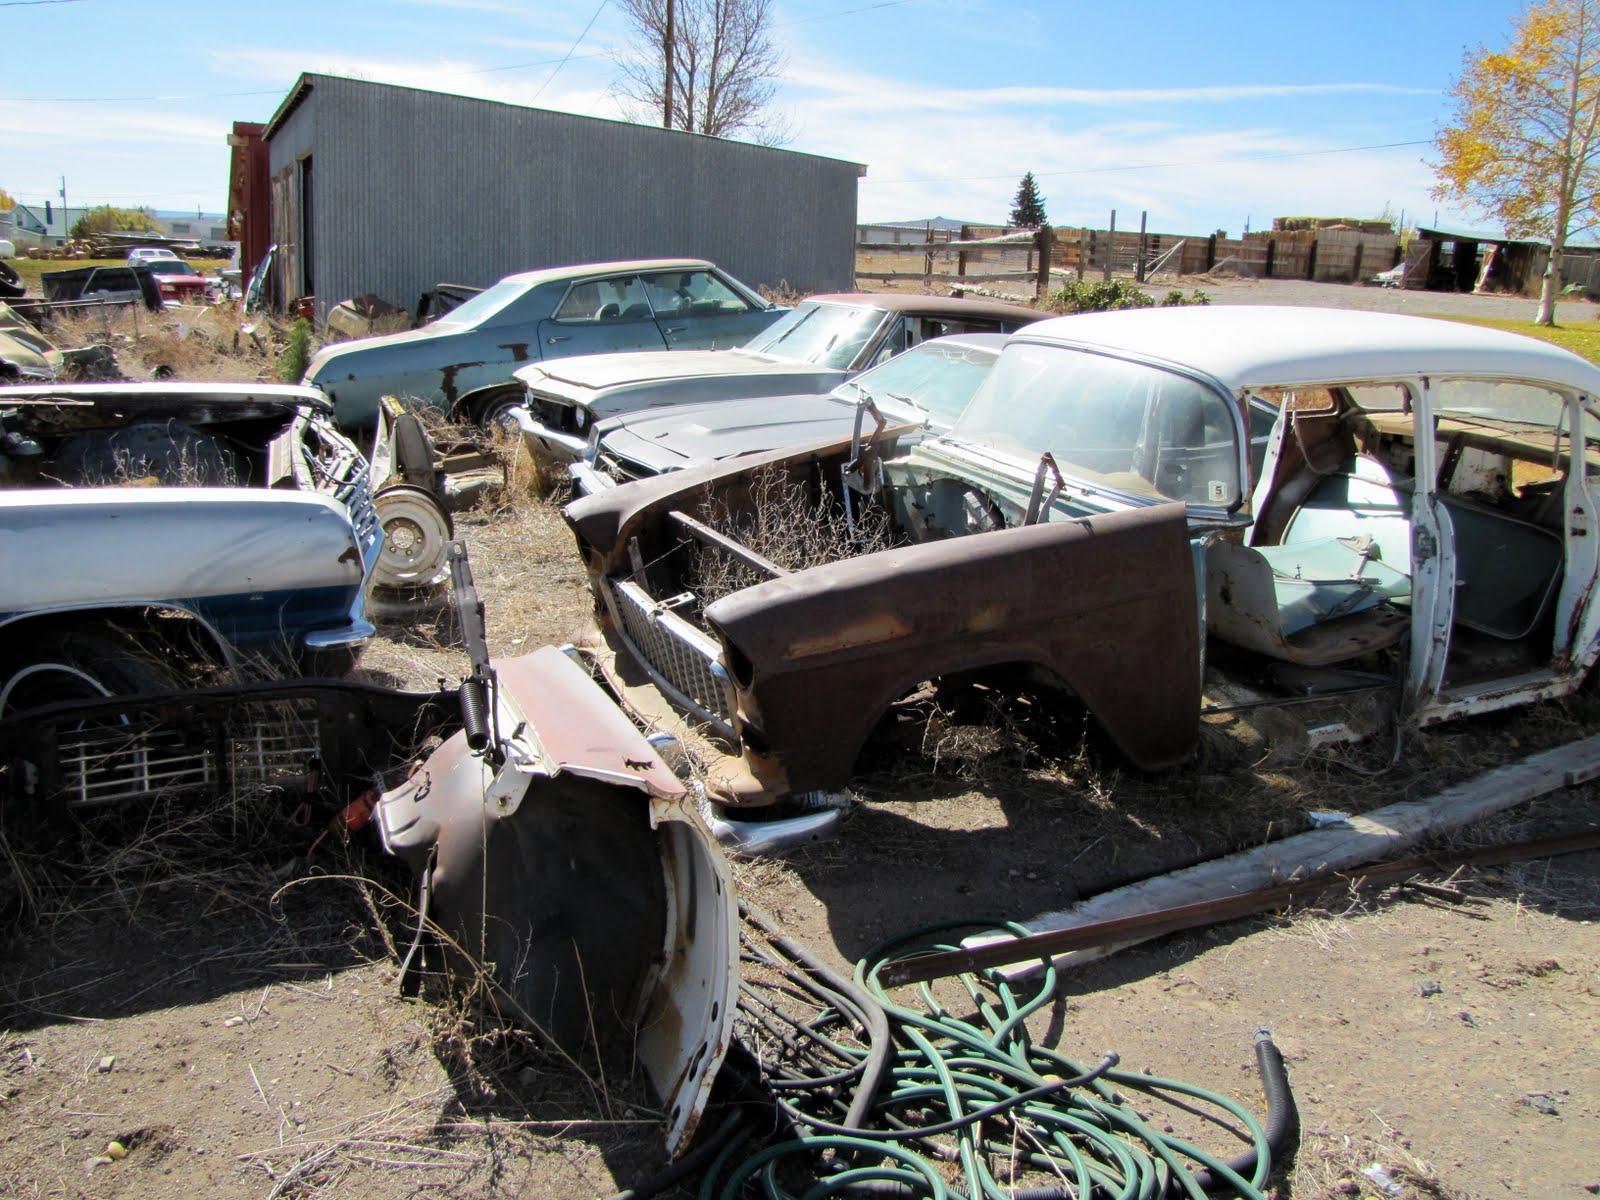 1956 Chevrolet Bel Air, 1975 Chevrolet Vega, 1968 Chevrolet Chevelle, 1972 Chevrolet Impala